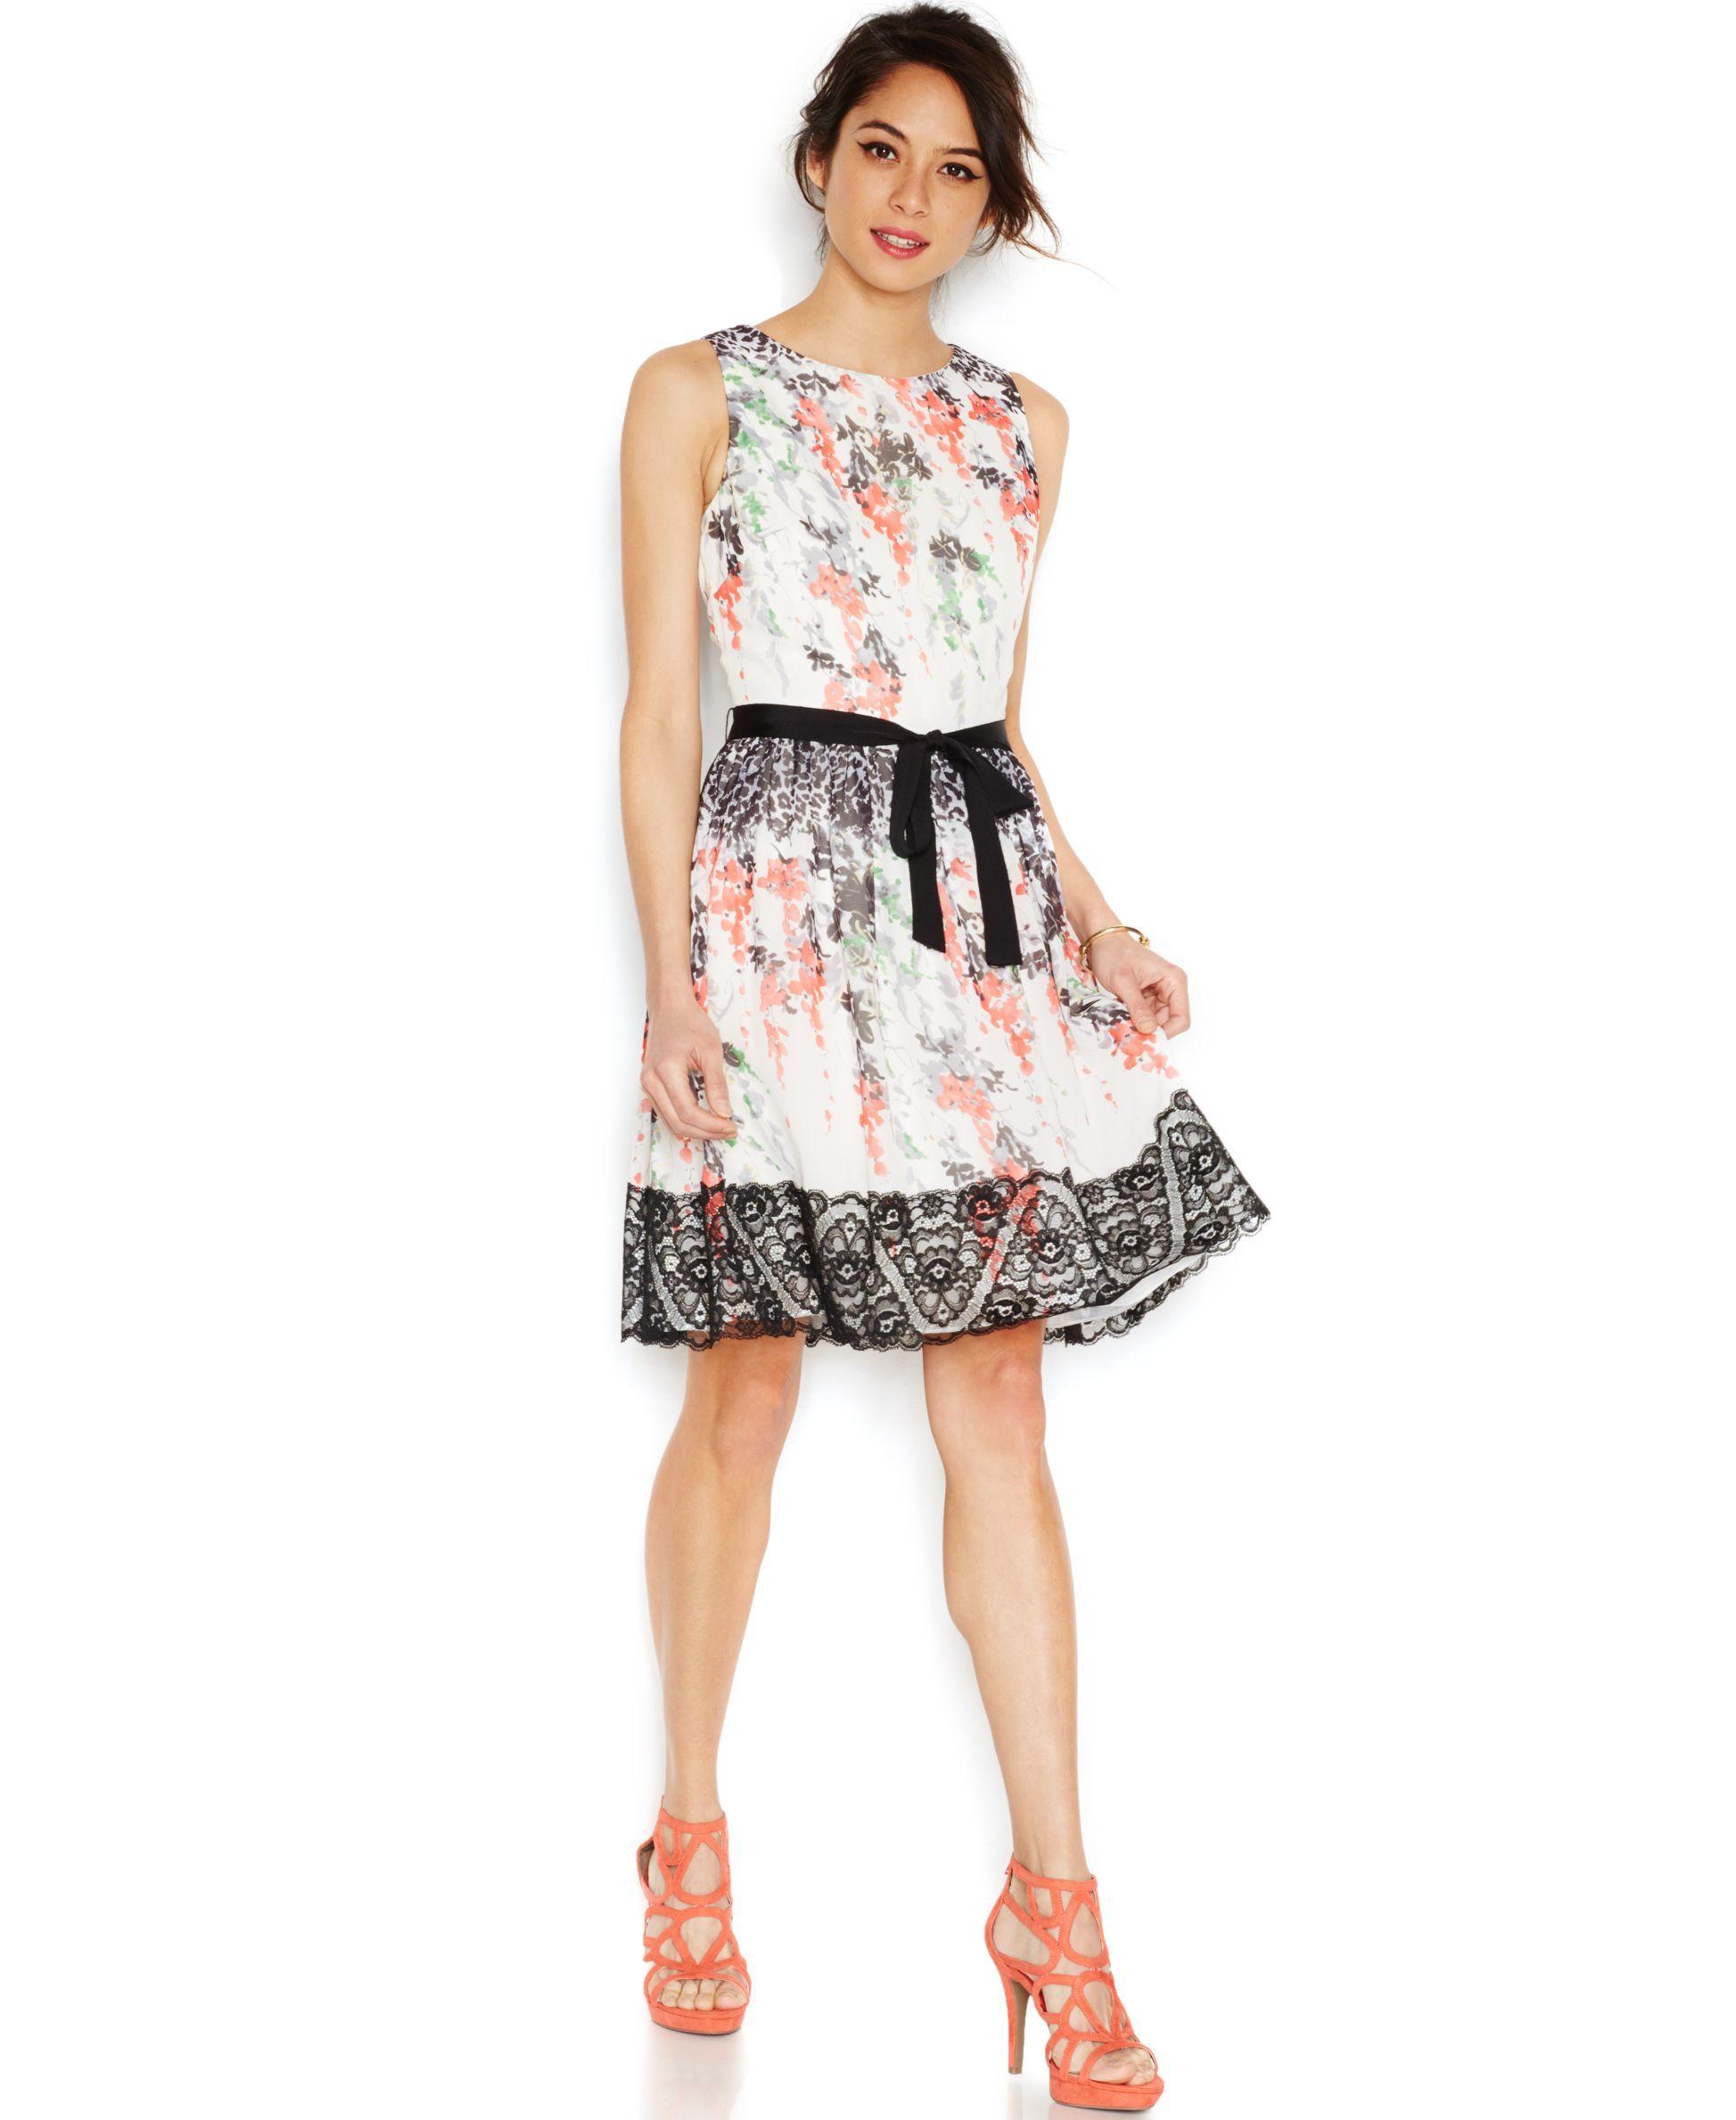 92c0765f9af2 Betsey Johnson Floral-Print Lace-Trim Dress   Products   Pinterest ...